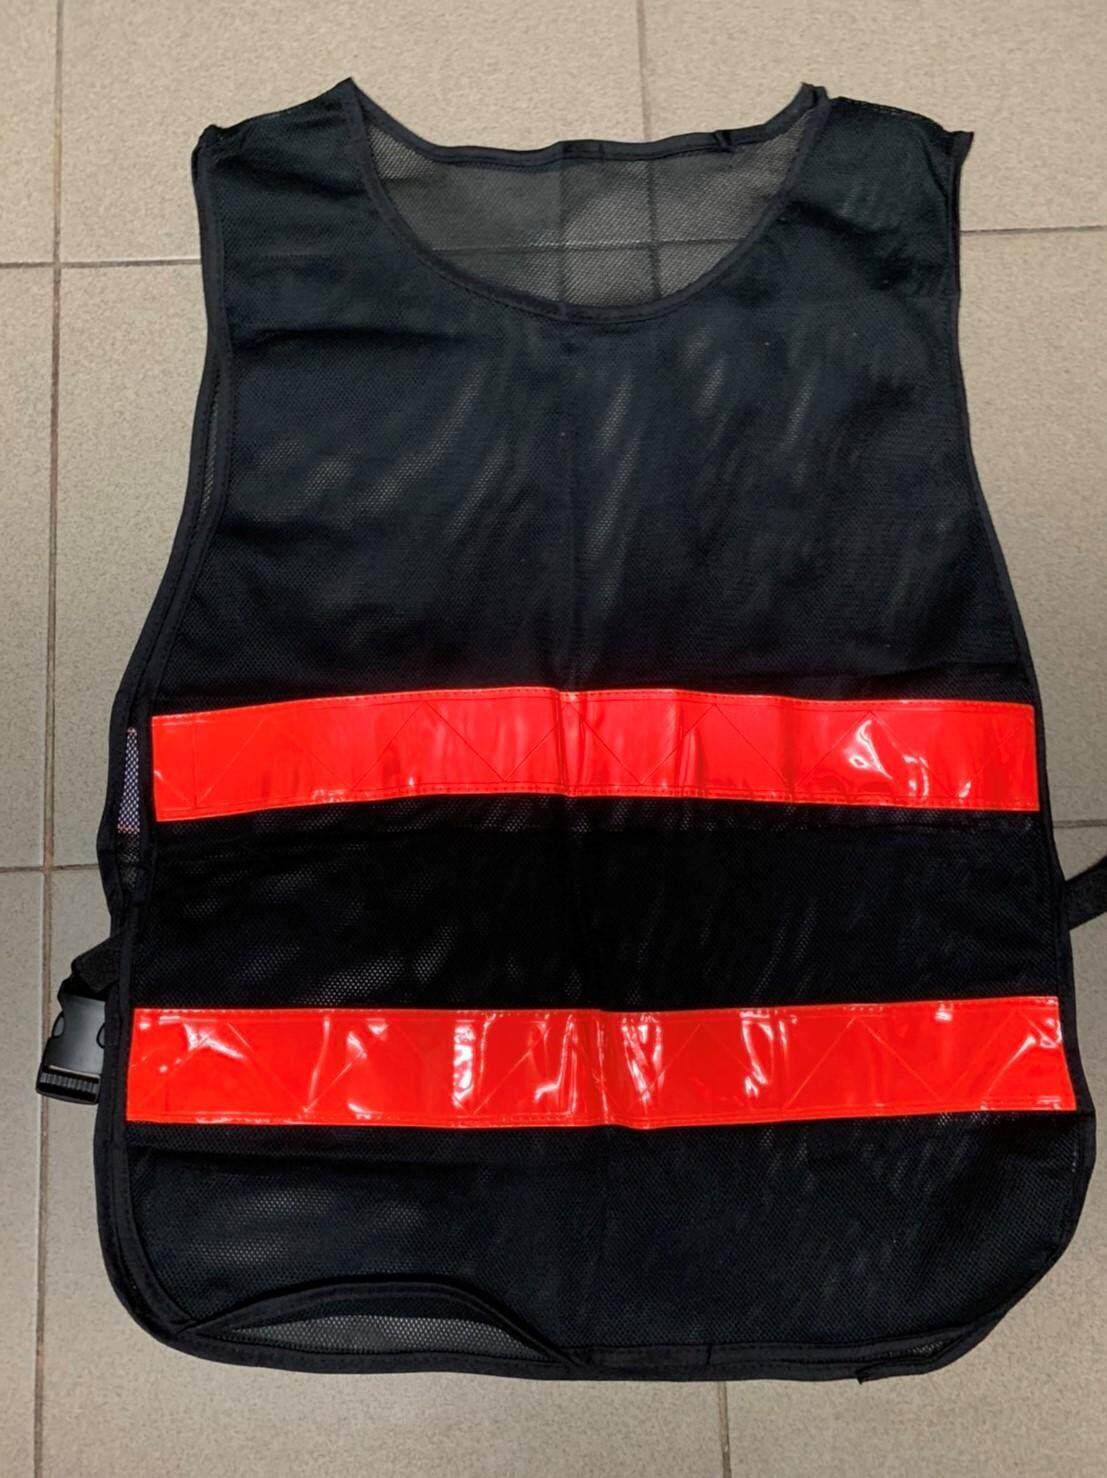 safety vest Reflective Vest เสื้อจราจร เสื้อกั๊กจราจร เสื้อกั๊กสะท้อนแสง เสื้อกั๊กสะท้อนแสง,ความปลอดภัยเสื้อกั๊กสะท้อนแสงเห็นได้ชัด Traffic Construction ชุดปั่นจักรยาน